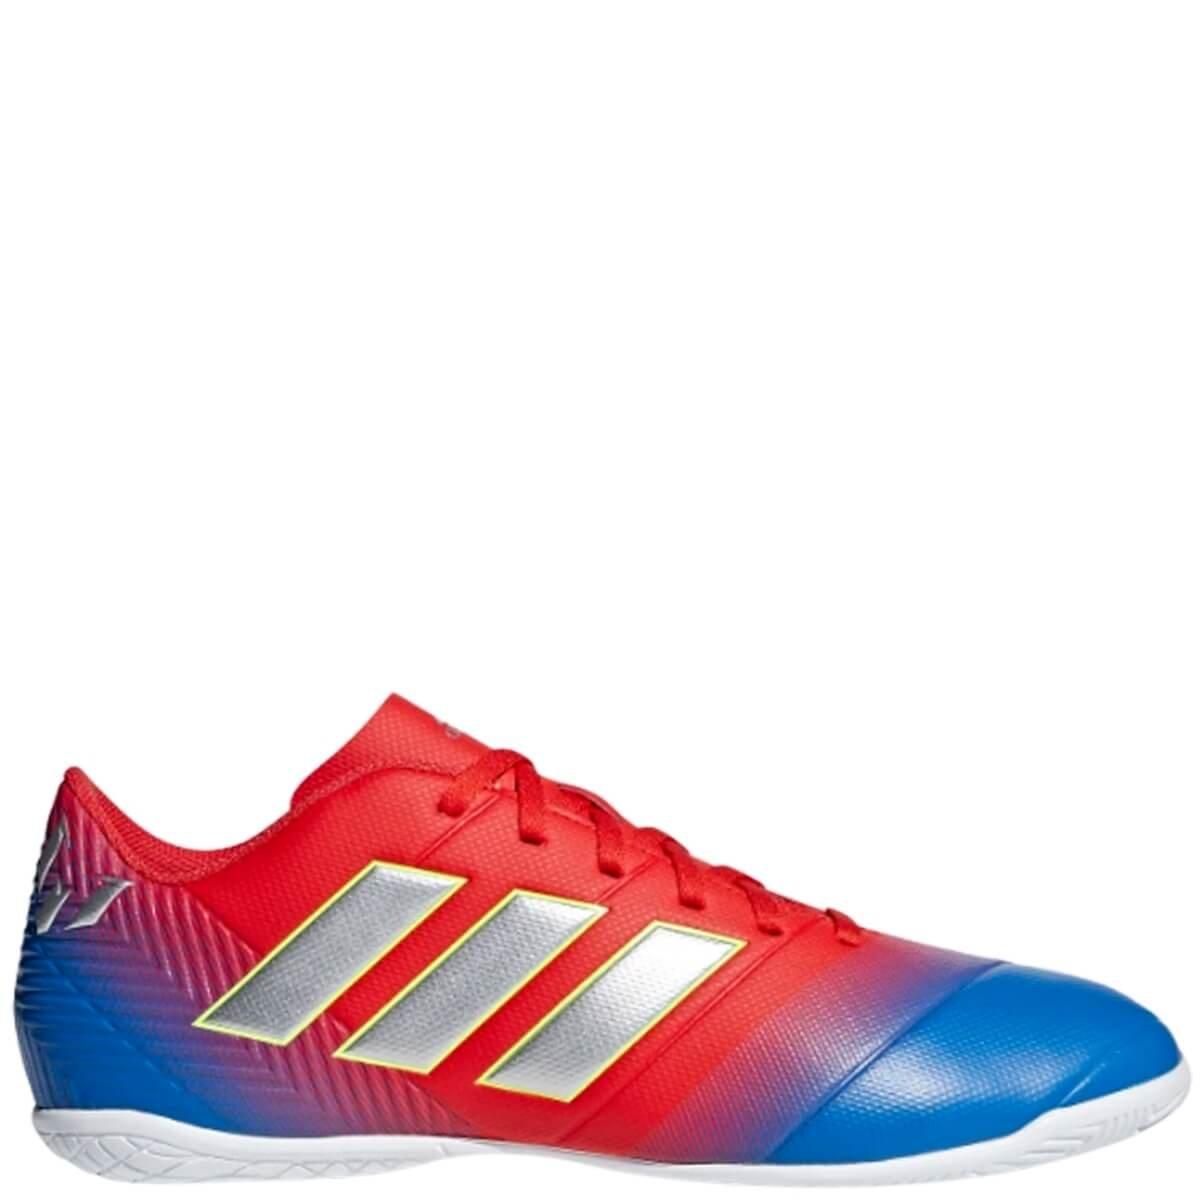 Chuteira Futsal Masculina Adidas Nemeziz Messi 18.4 D97264 - Azul Vermelho   e58c39b69bce7